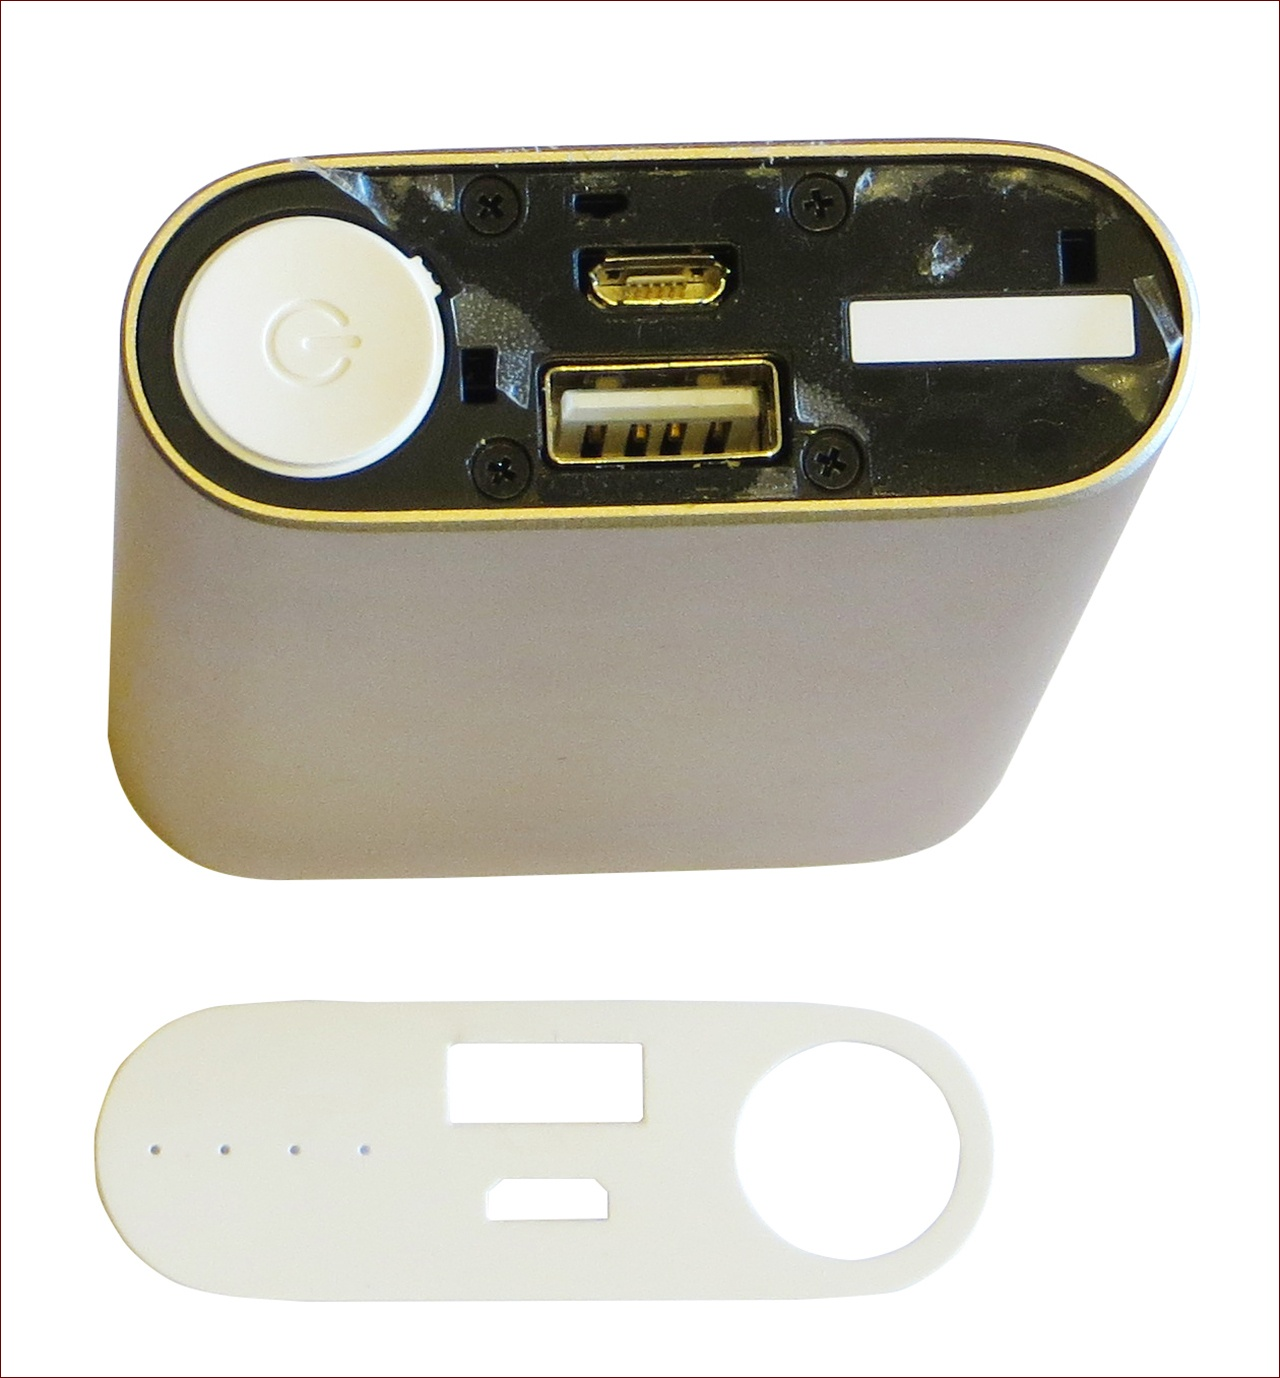 Внешние аккумуляторы HIPER и Xiaomi Mi — взгляд дилетанта - 53